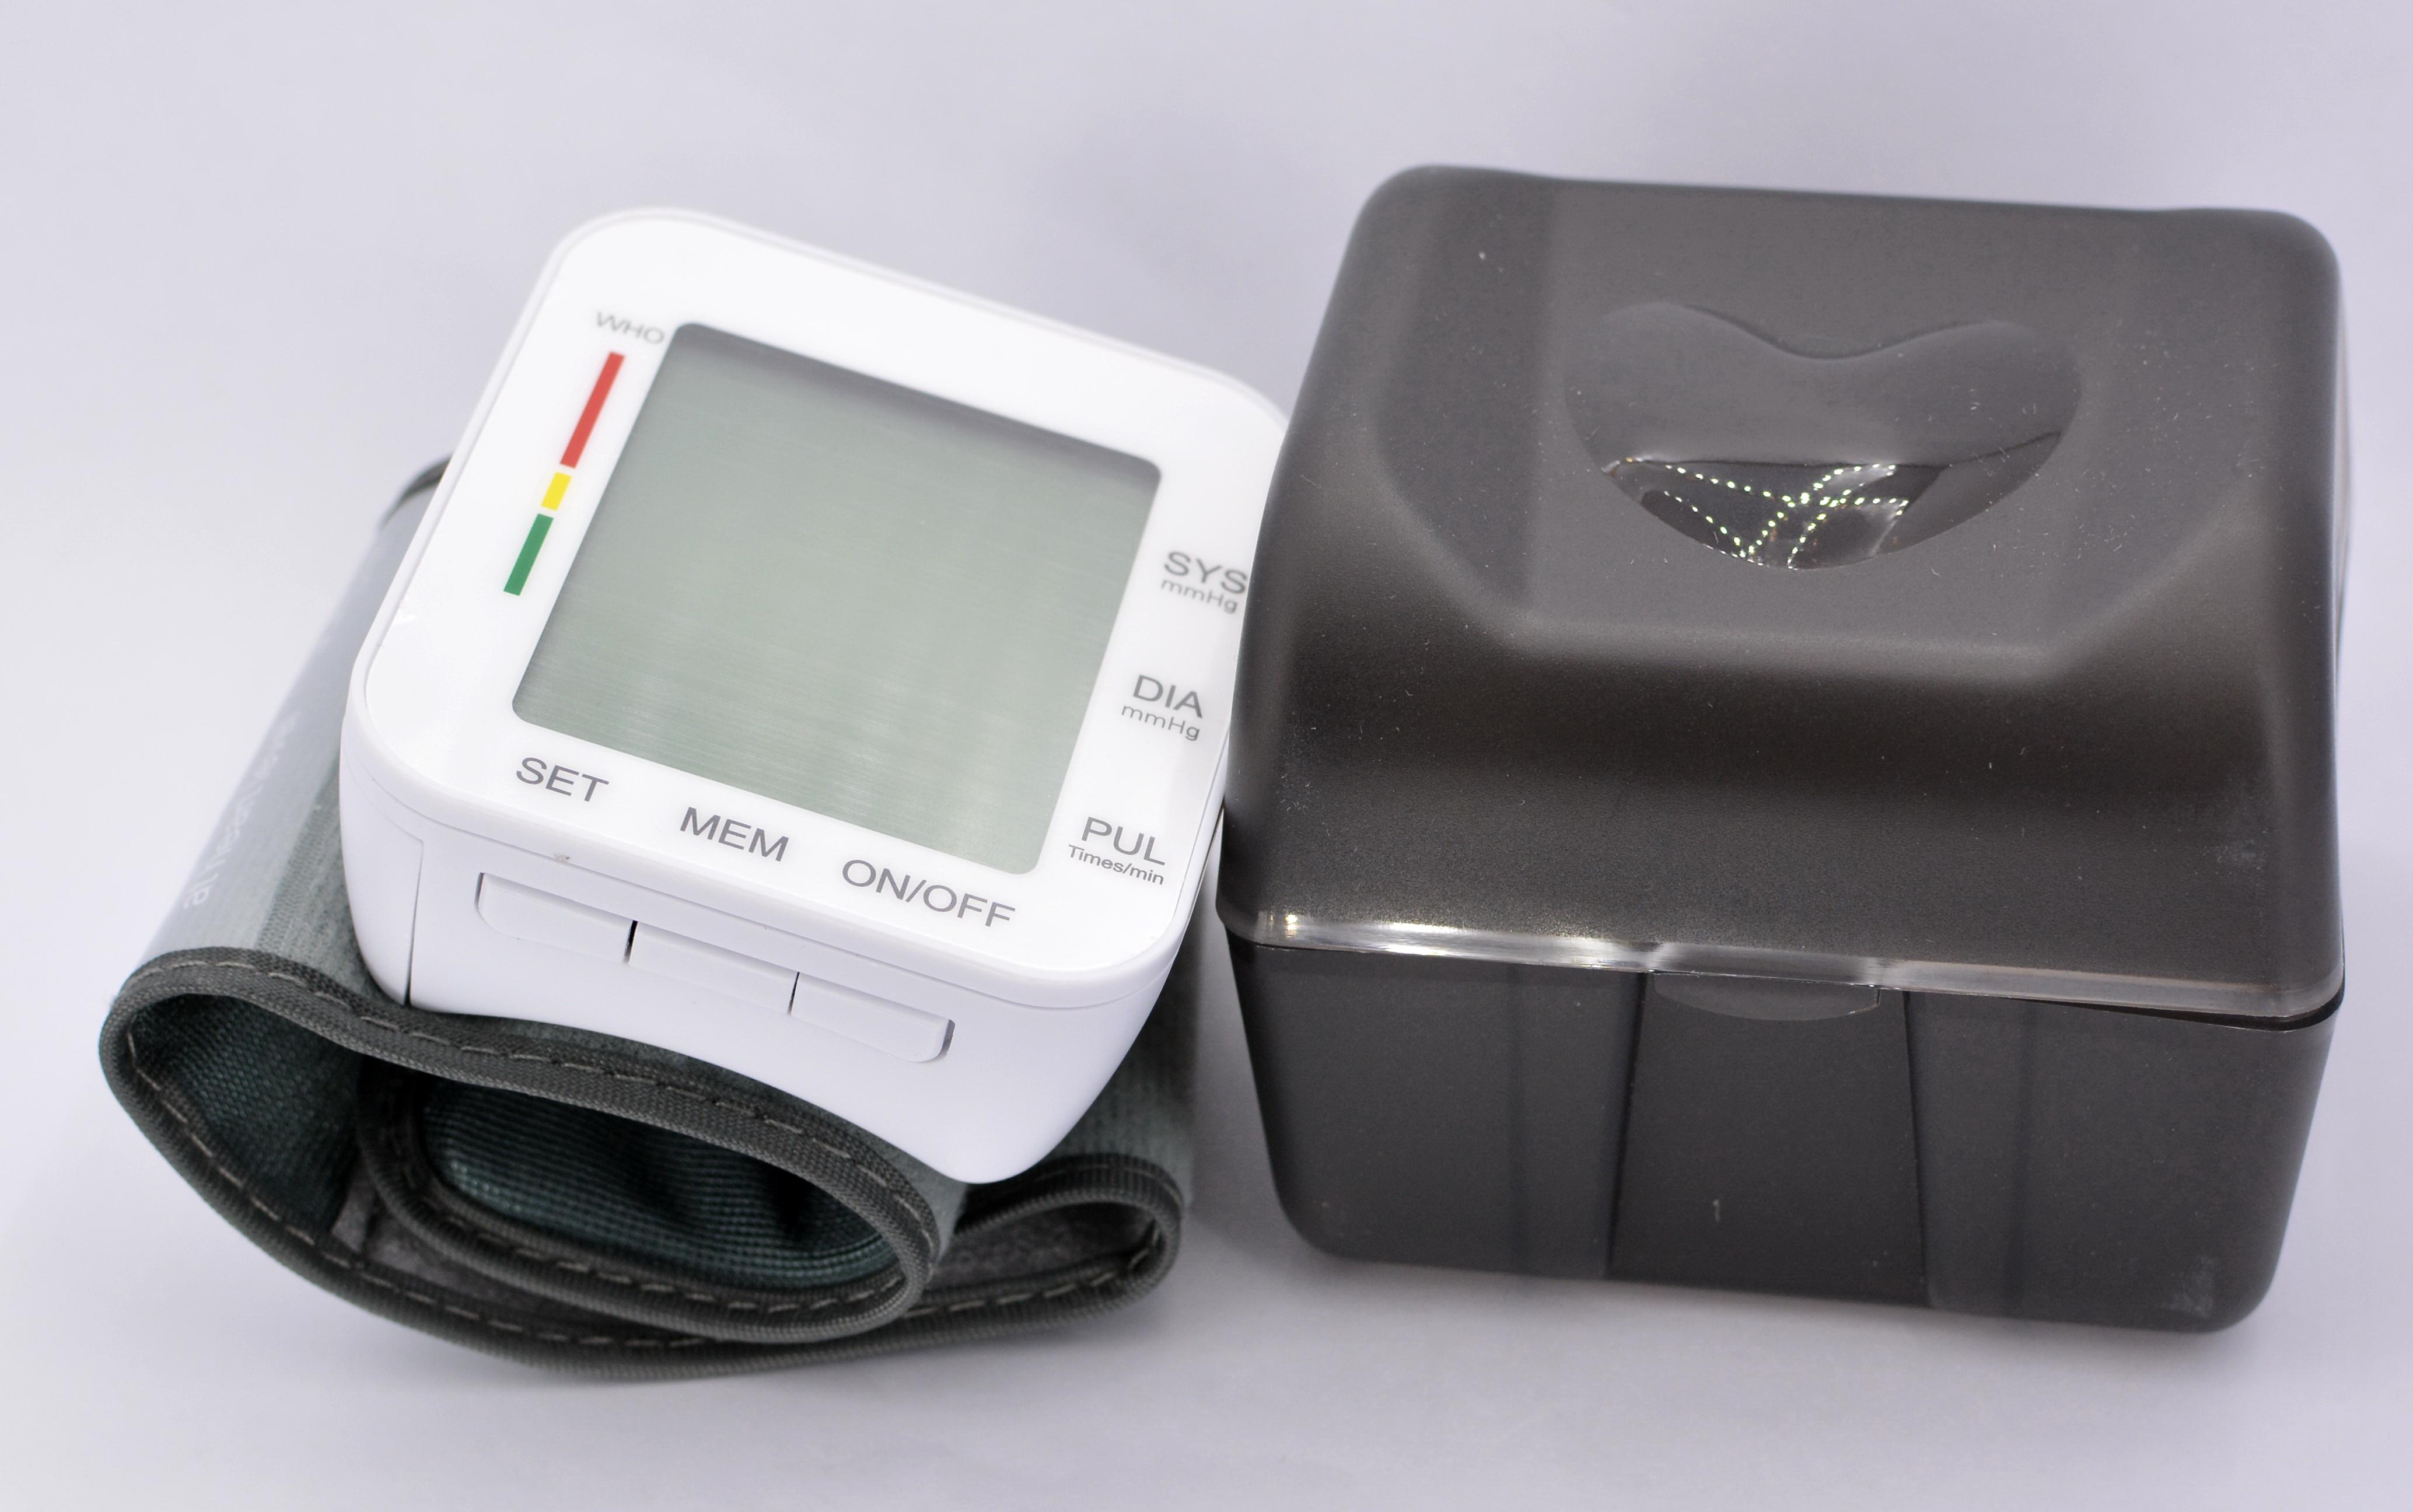 Tensiometru de incheietura Optimus AT RZ204 automat, oscilometric, manseta 13-19,5 cm, baterii 2xAAA, 2 utilizatori x 99 memorii, 00-280 mmHg, 40-195 bpm, functie vocala, cutie depozitare [4]